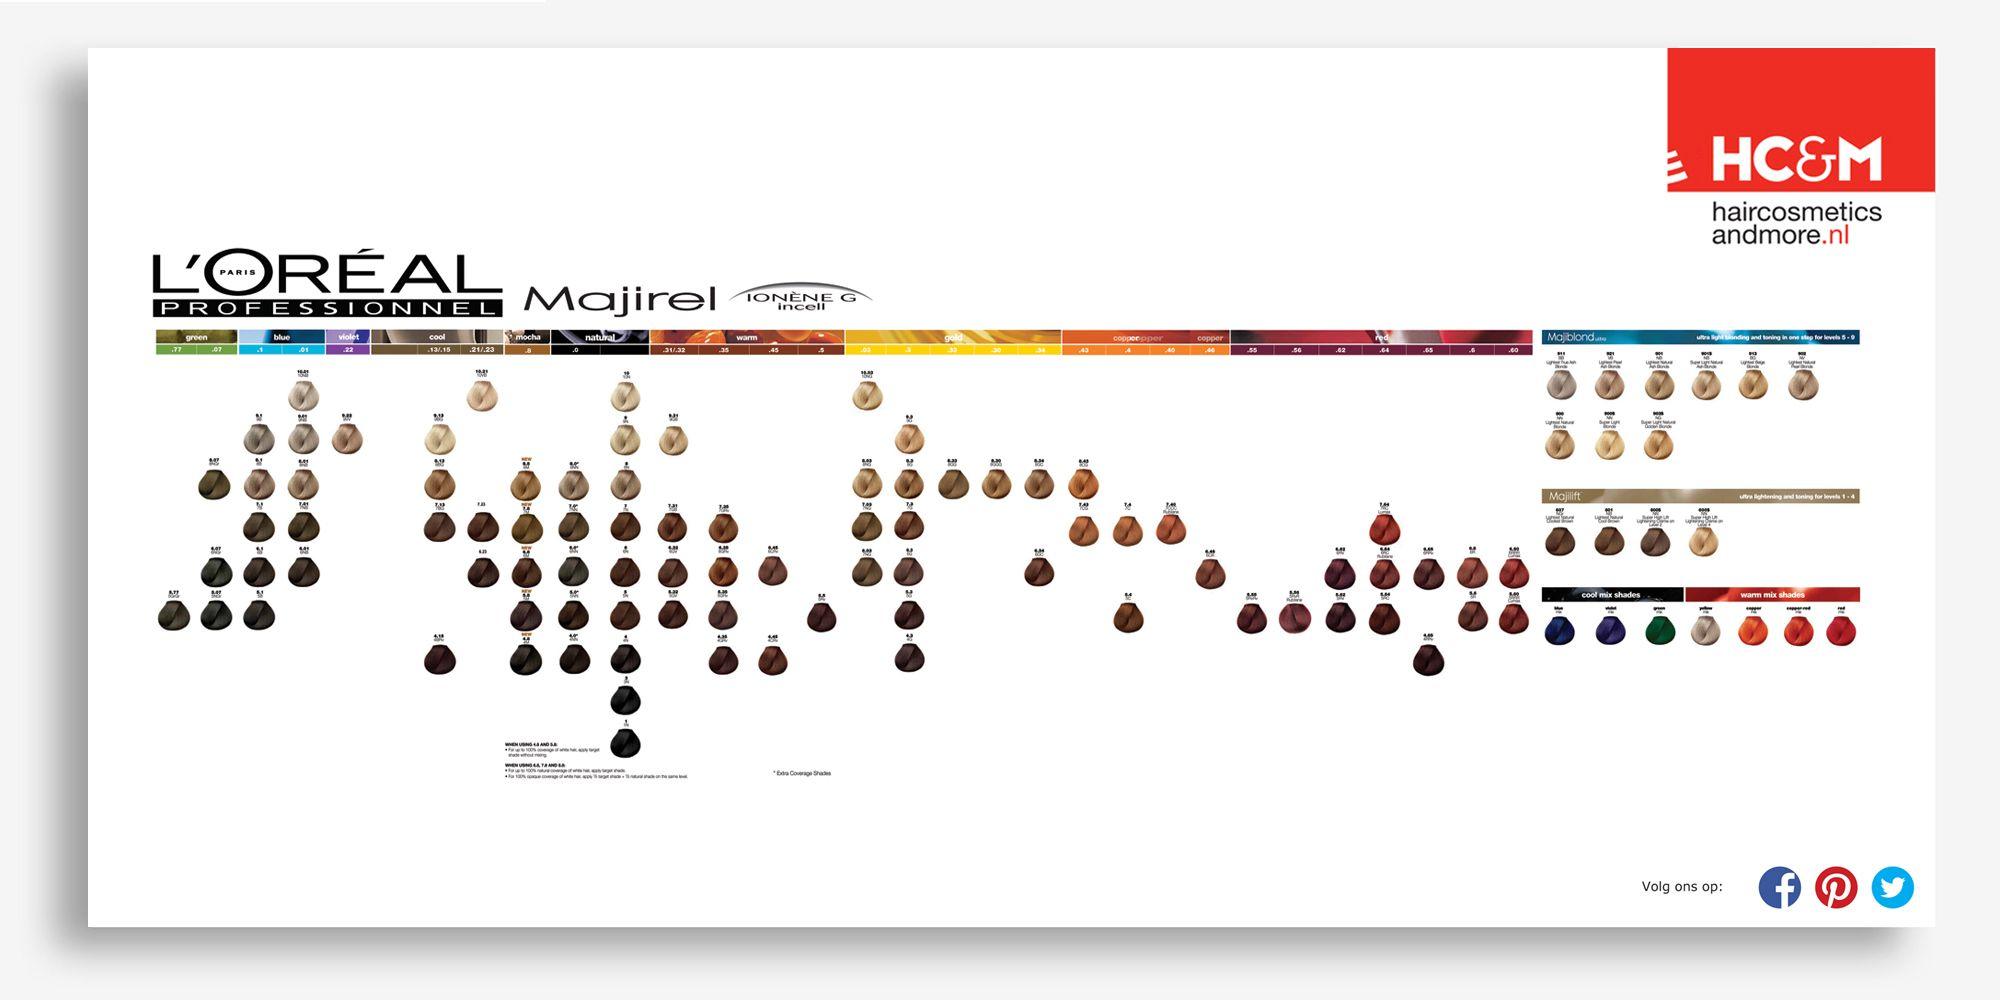 Majirel colour chart - Hc M Majirel Color Chart Preview